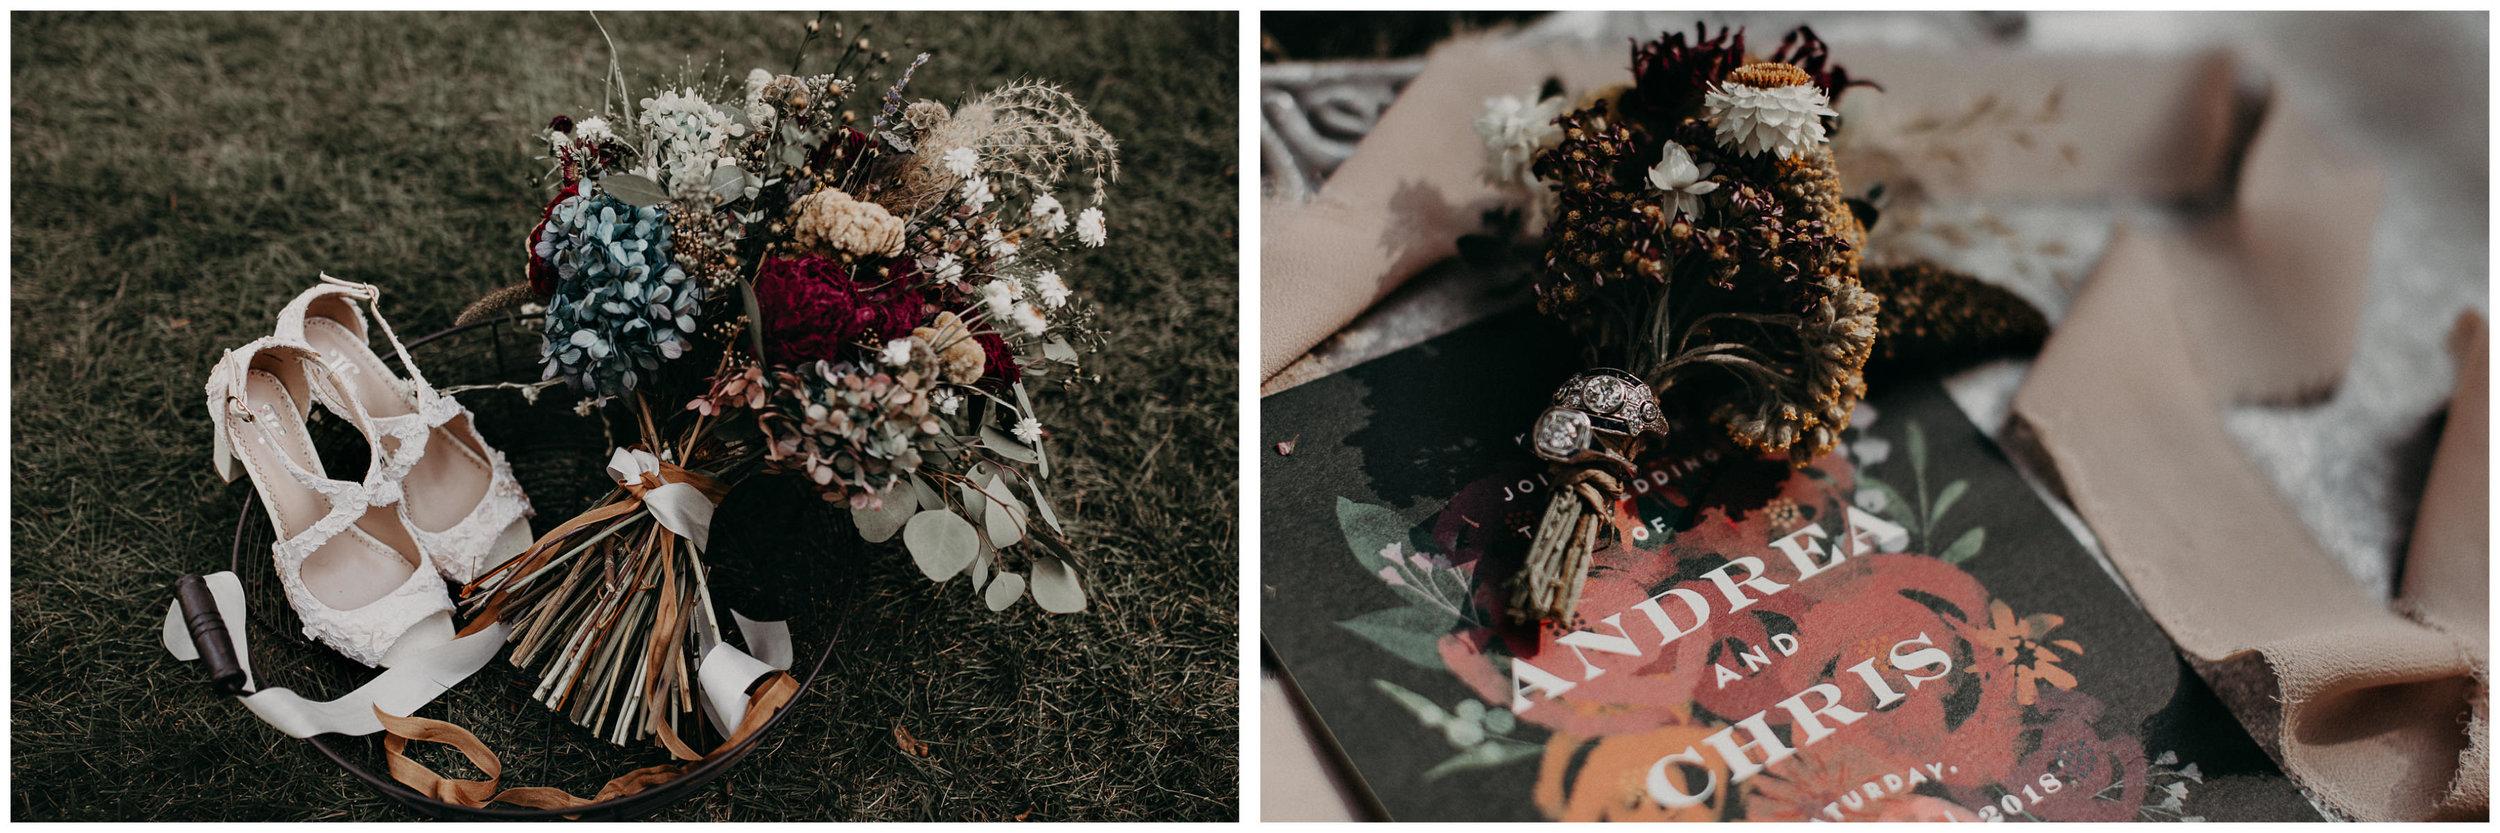 4 Wedding Vintage Shoes Atlanta-GA, Wedding Photographer .jpg